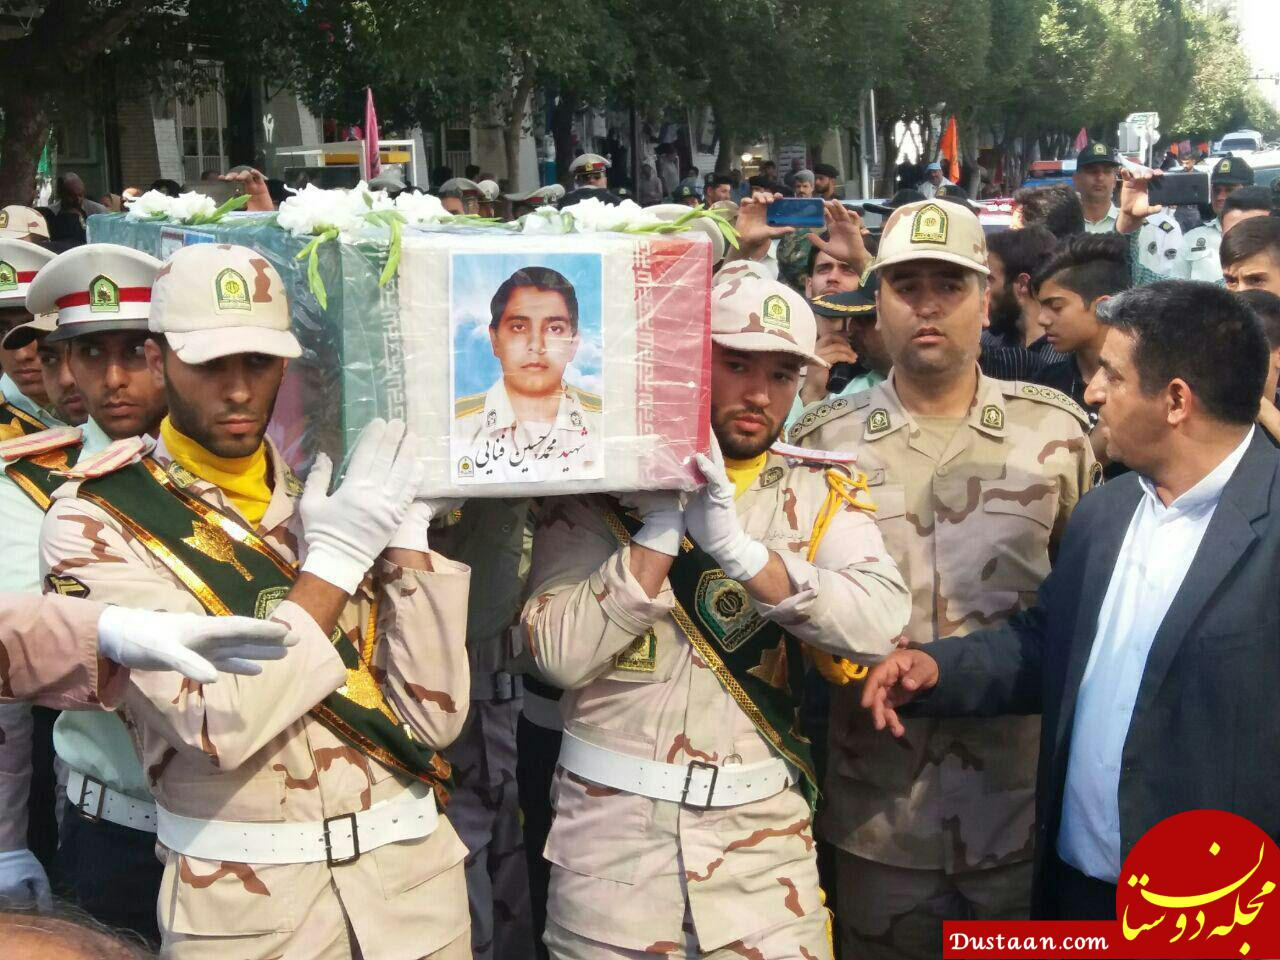 www.dustaan.com مراسم تشییع پیکر مطهر سرباز شهید مرزبانی، «محمدحسین فنایی» +عکس